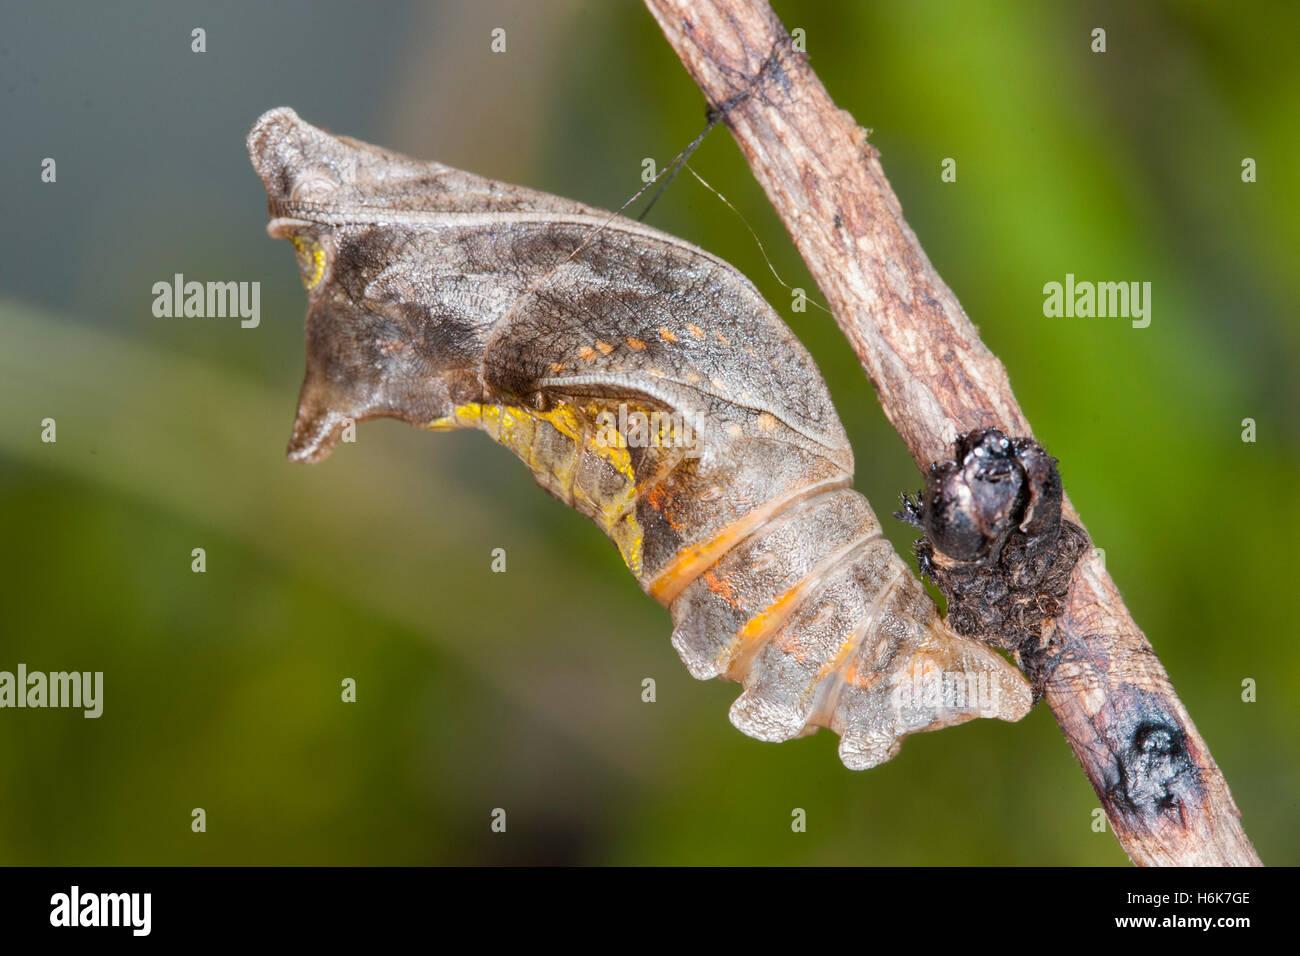 Polydamas Swallowtail   Battus polydamas    Gomez Farias, Mexico 26 January 2004       Pupa just before adult emerged. - Stock Image